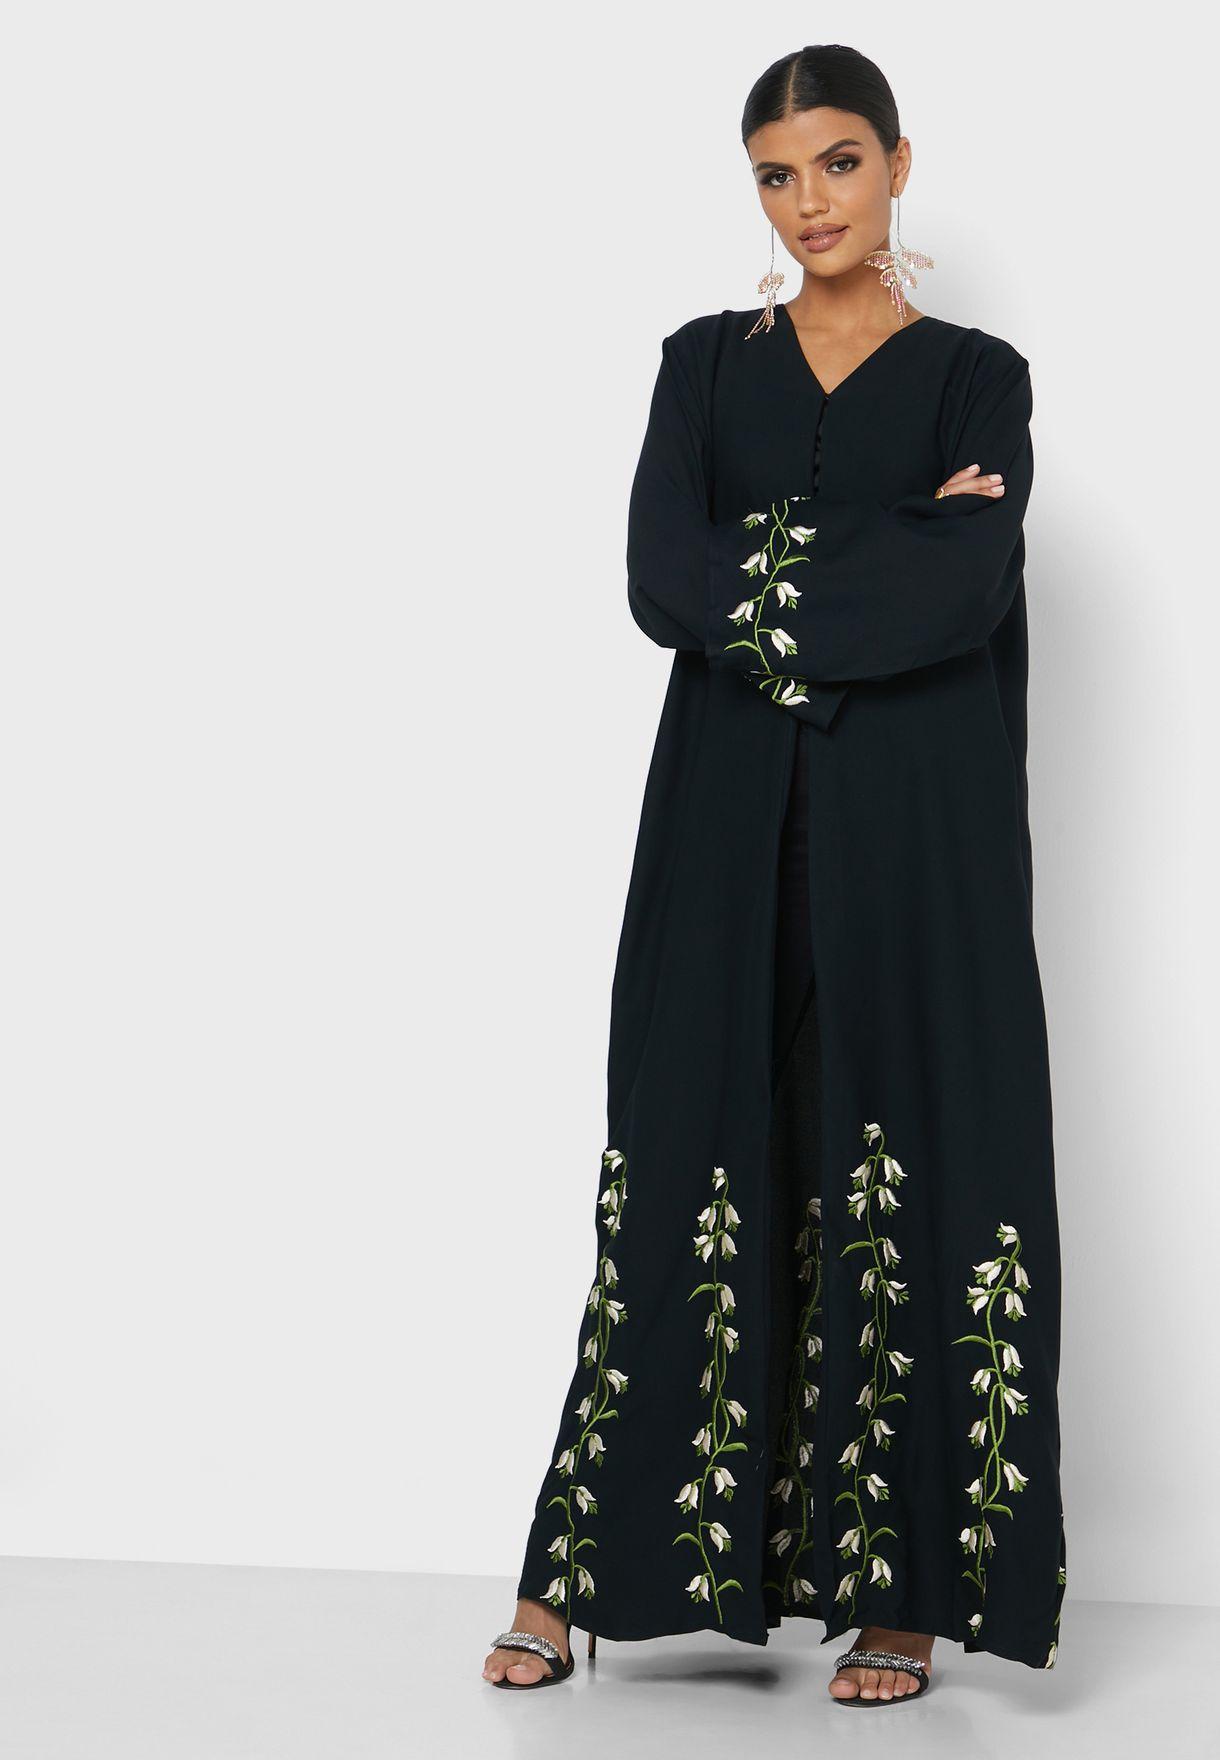 Umbrella Cut Embroidered Abaya